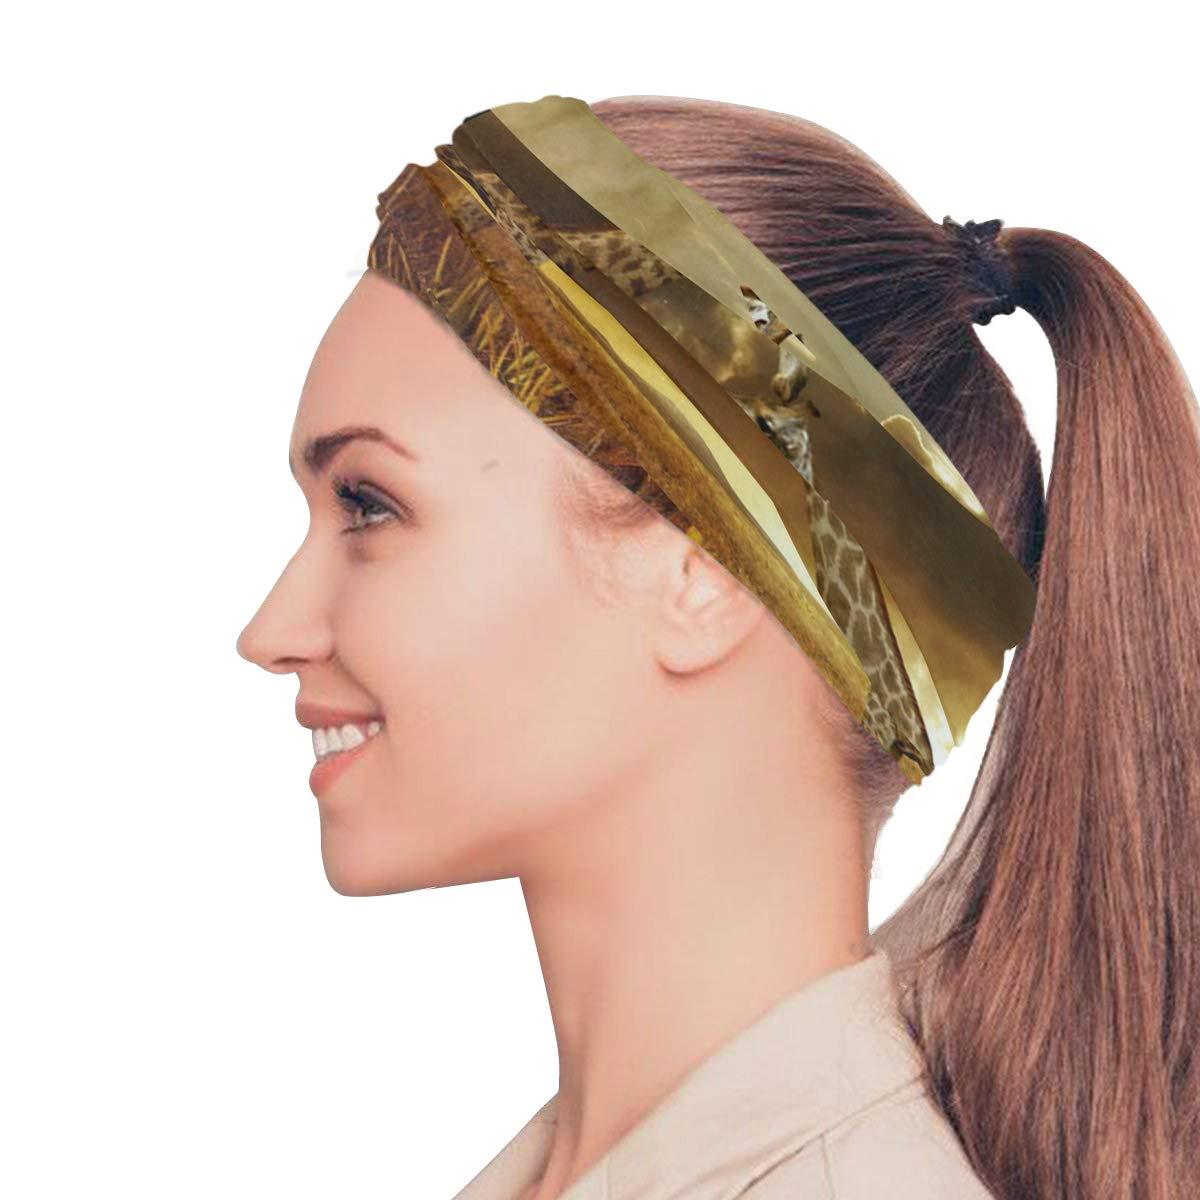 Face Mask Neckerchief Foulard Journey To Japan Land Of The Rising Sun Headband Womens Bandana Multifunctional Mens Balaclava Neck Warmer